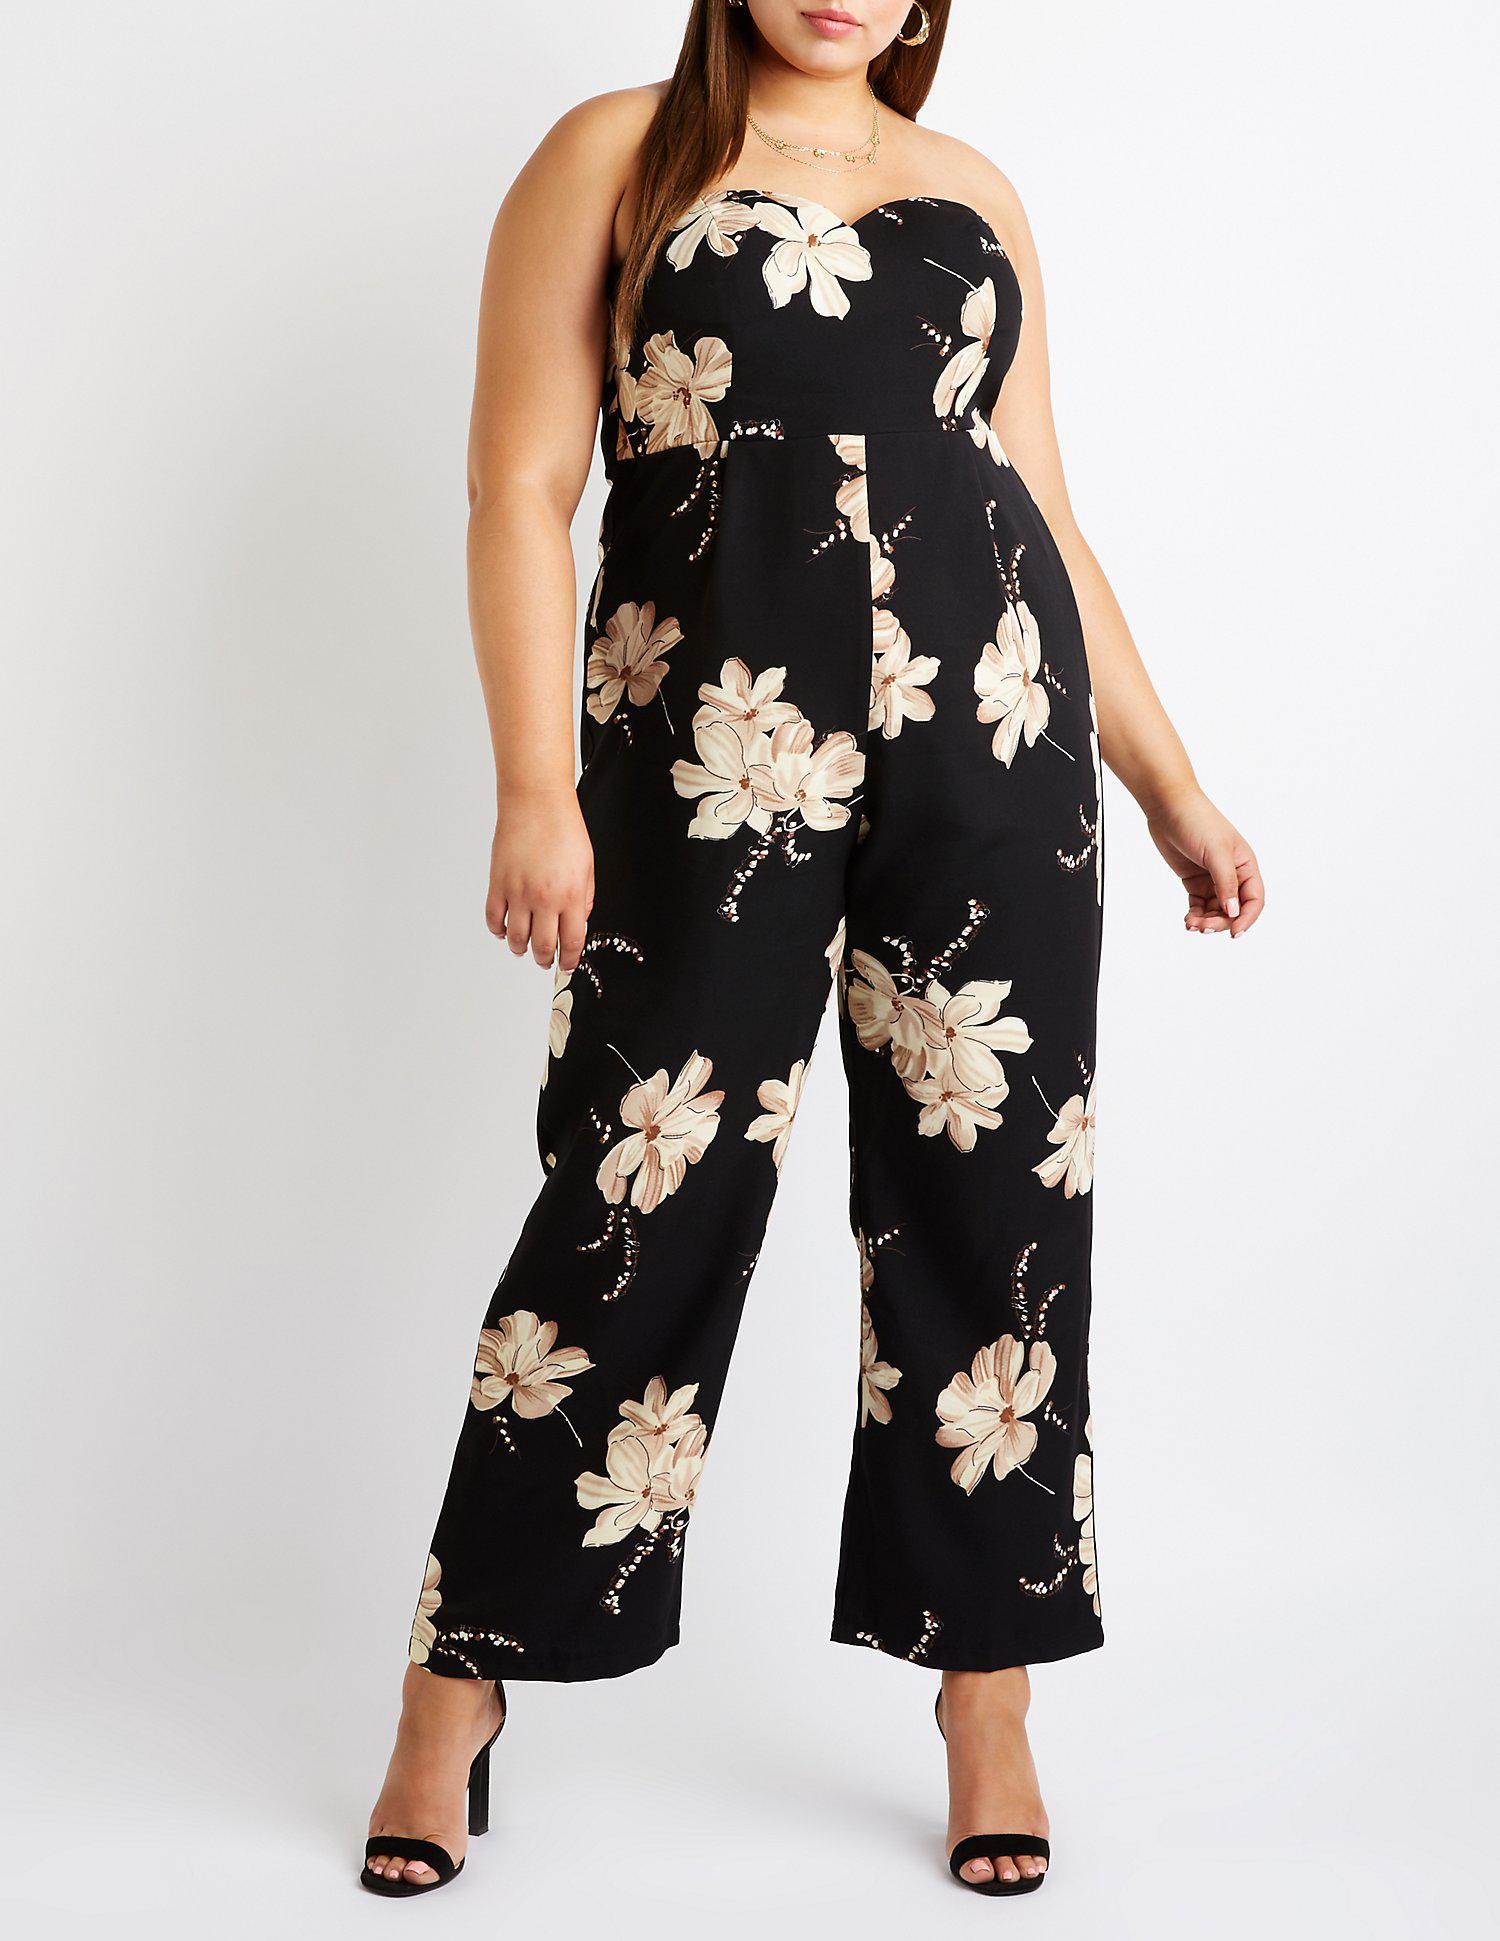 779693647b4 Lyst - Charlotte Russe Plus Size Floral V Neck Jumpsuit in Black ...